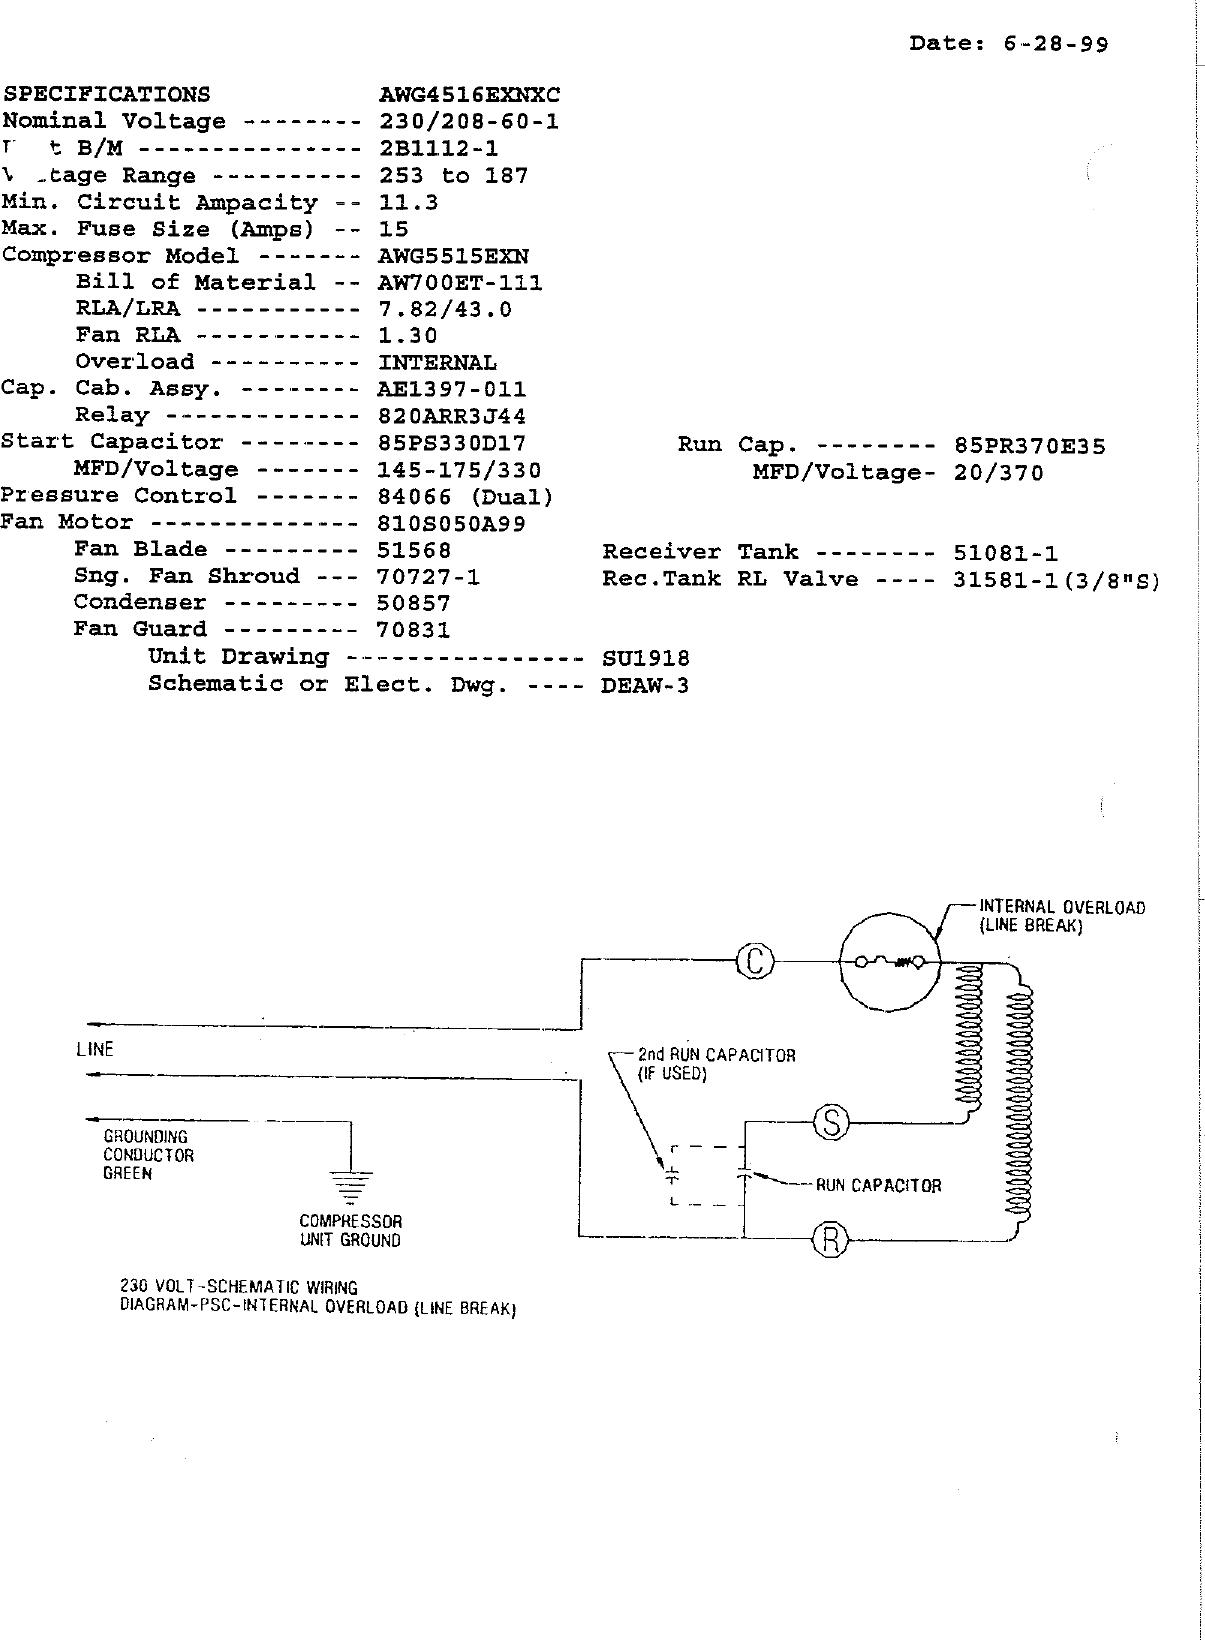 Tecumseh Awg4516Exnxc Performance Data Sheet